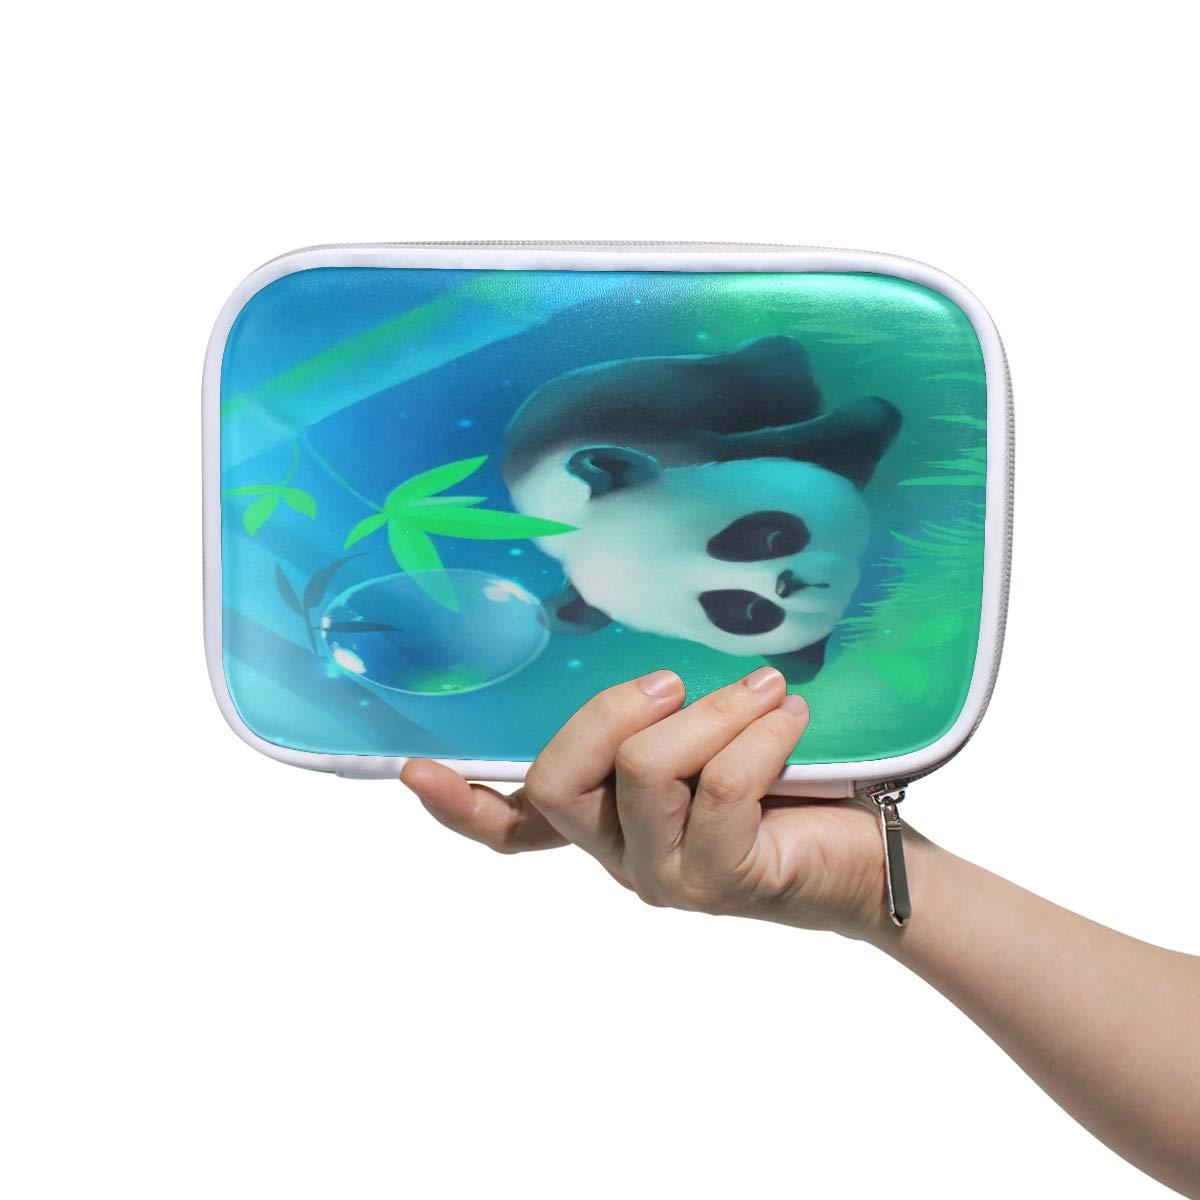 Panda - Estuche para lápices con burbujas de agua, estuche para lápices, bolsa de mano, bolsa de viaje de bambú para maquillaje, bolsa para pasaporte, almacenamiento para mujeres: Amazon.es: Oficina y papelería